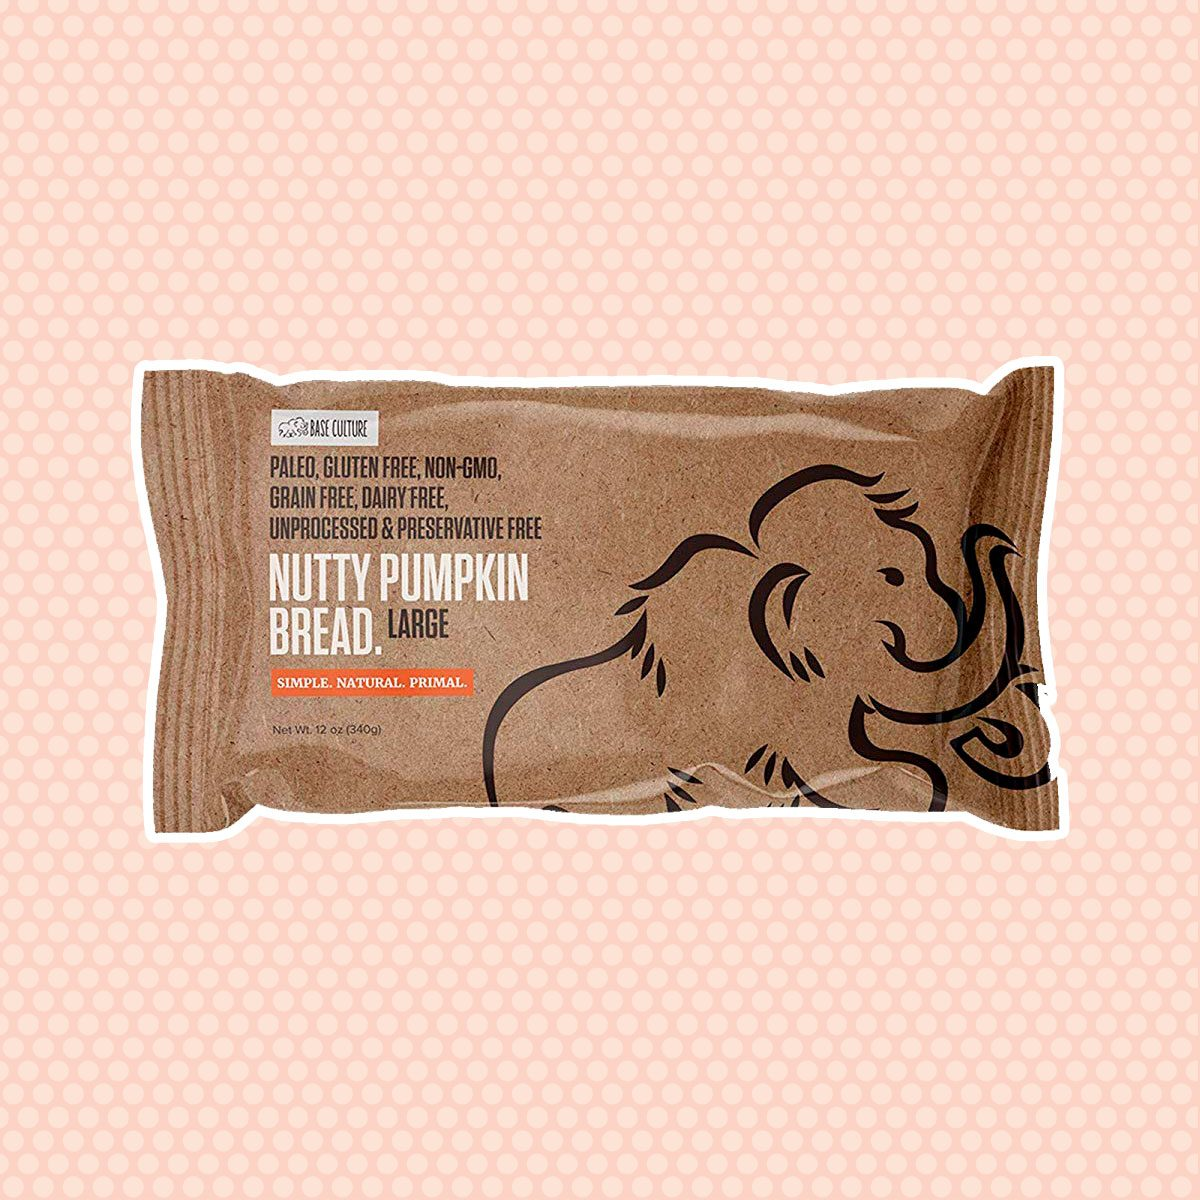 Base Culture Nutty Pumpkin Bread